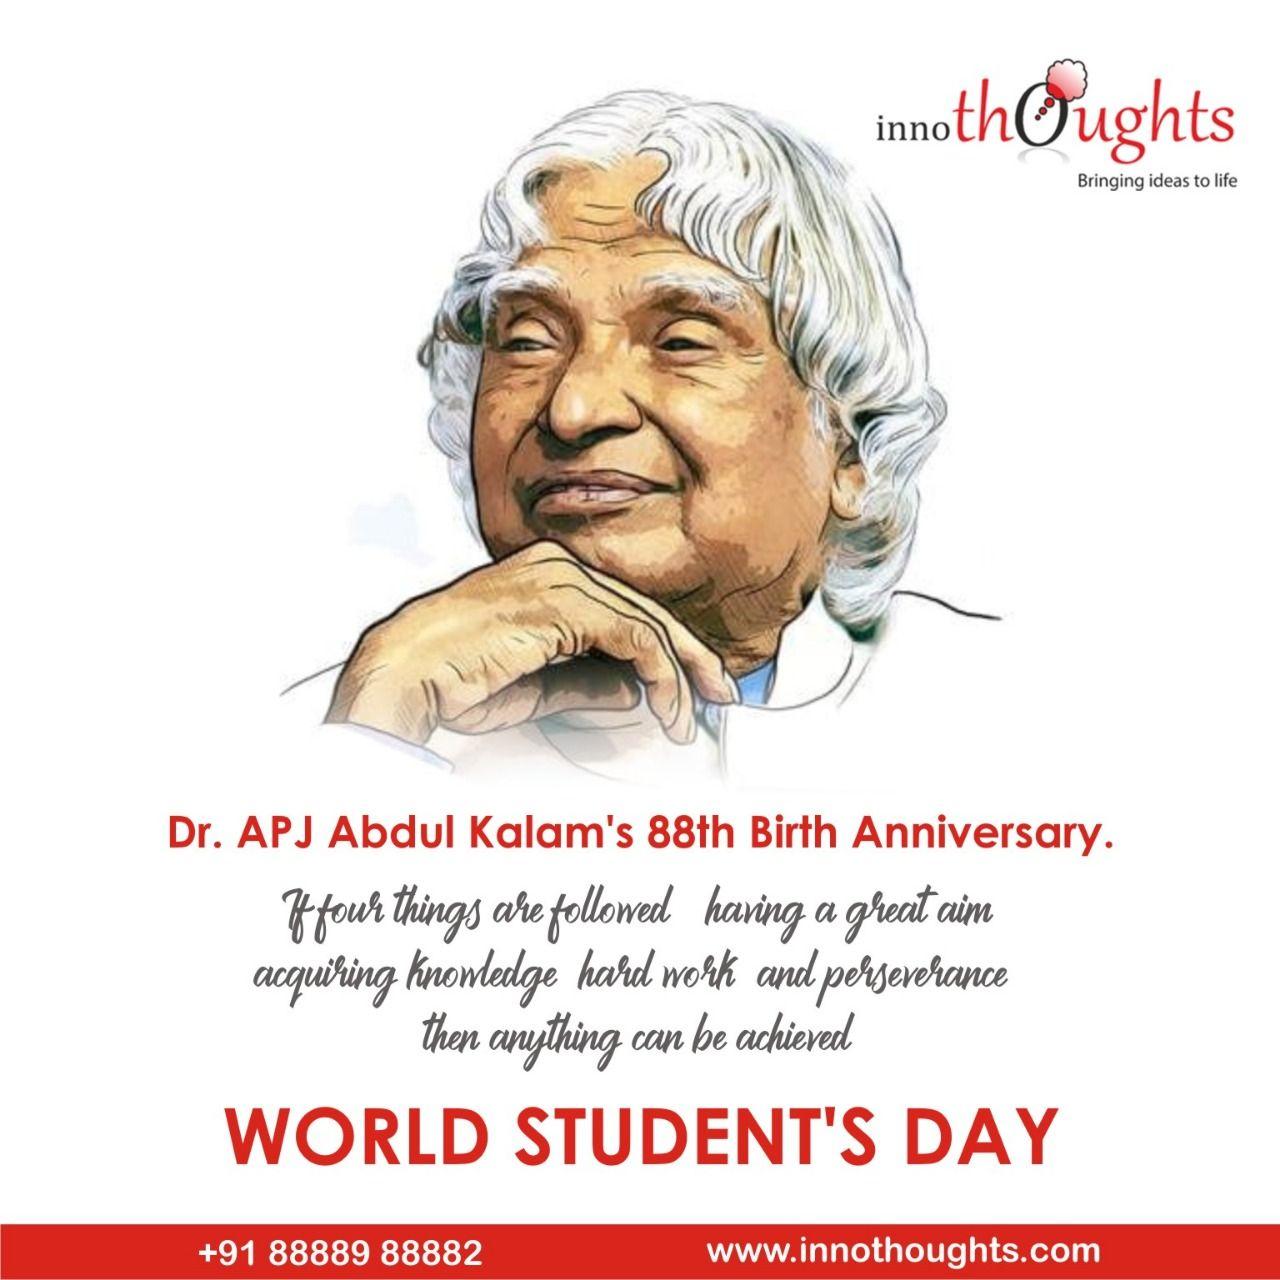 15th October, former president APJ Abdul Kalam's birthday